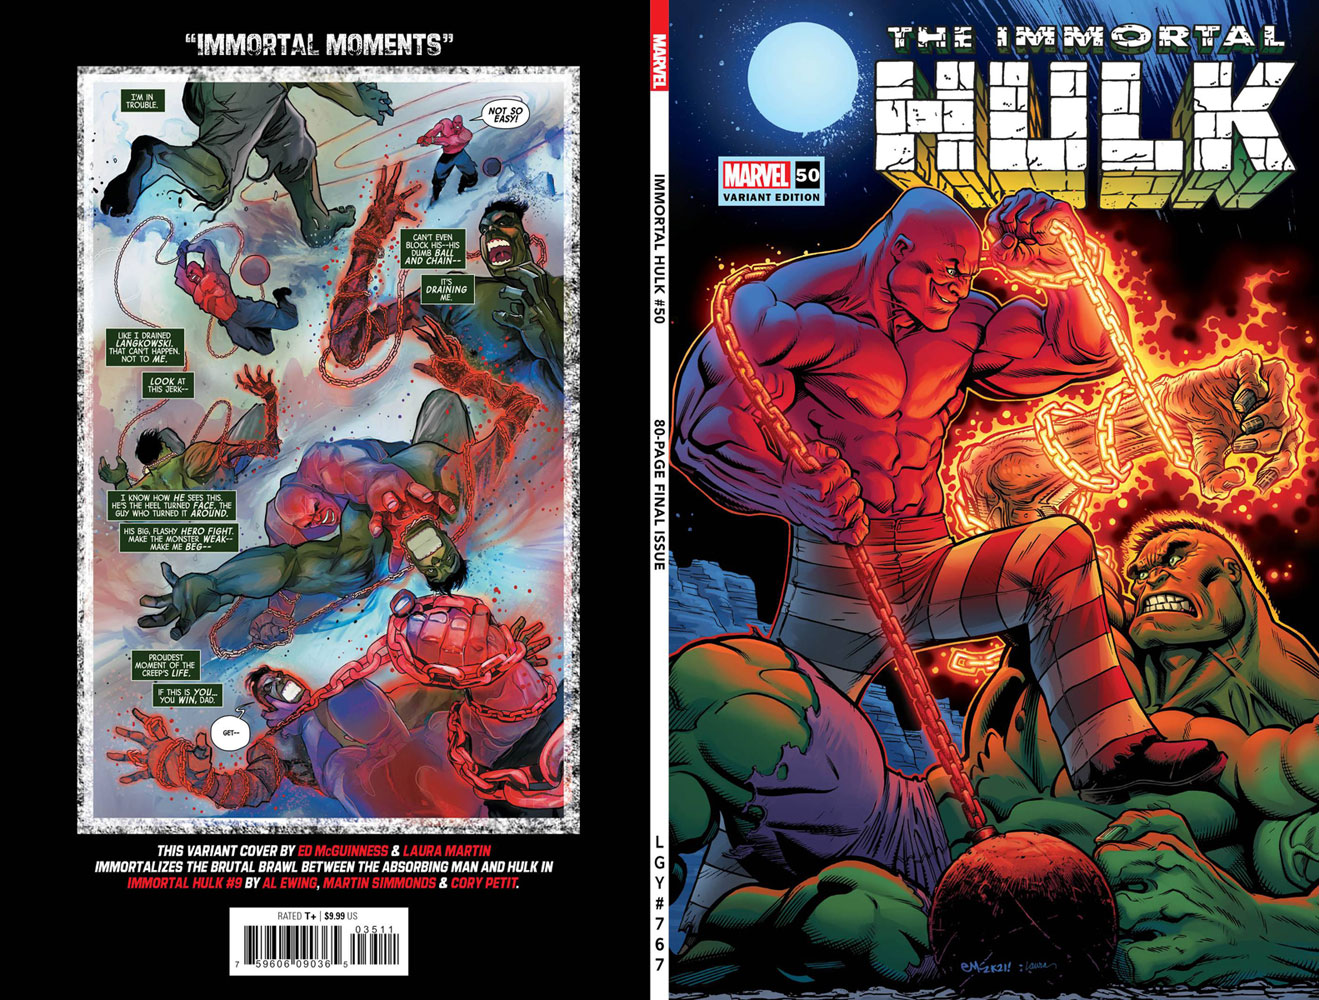 Immortal Hulk #50 (incentive 1:50 cover - McGuinness) - Marvel Comics